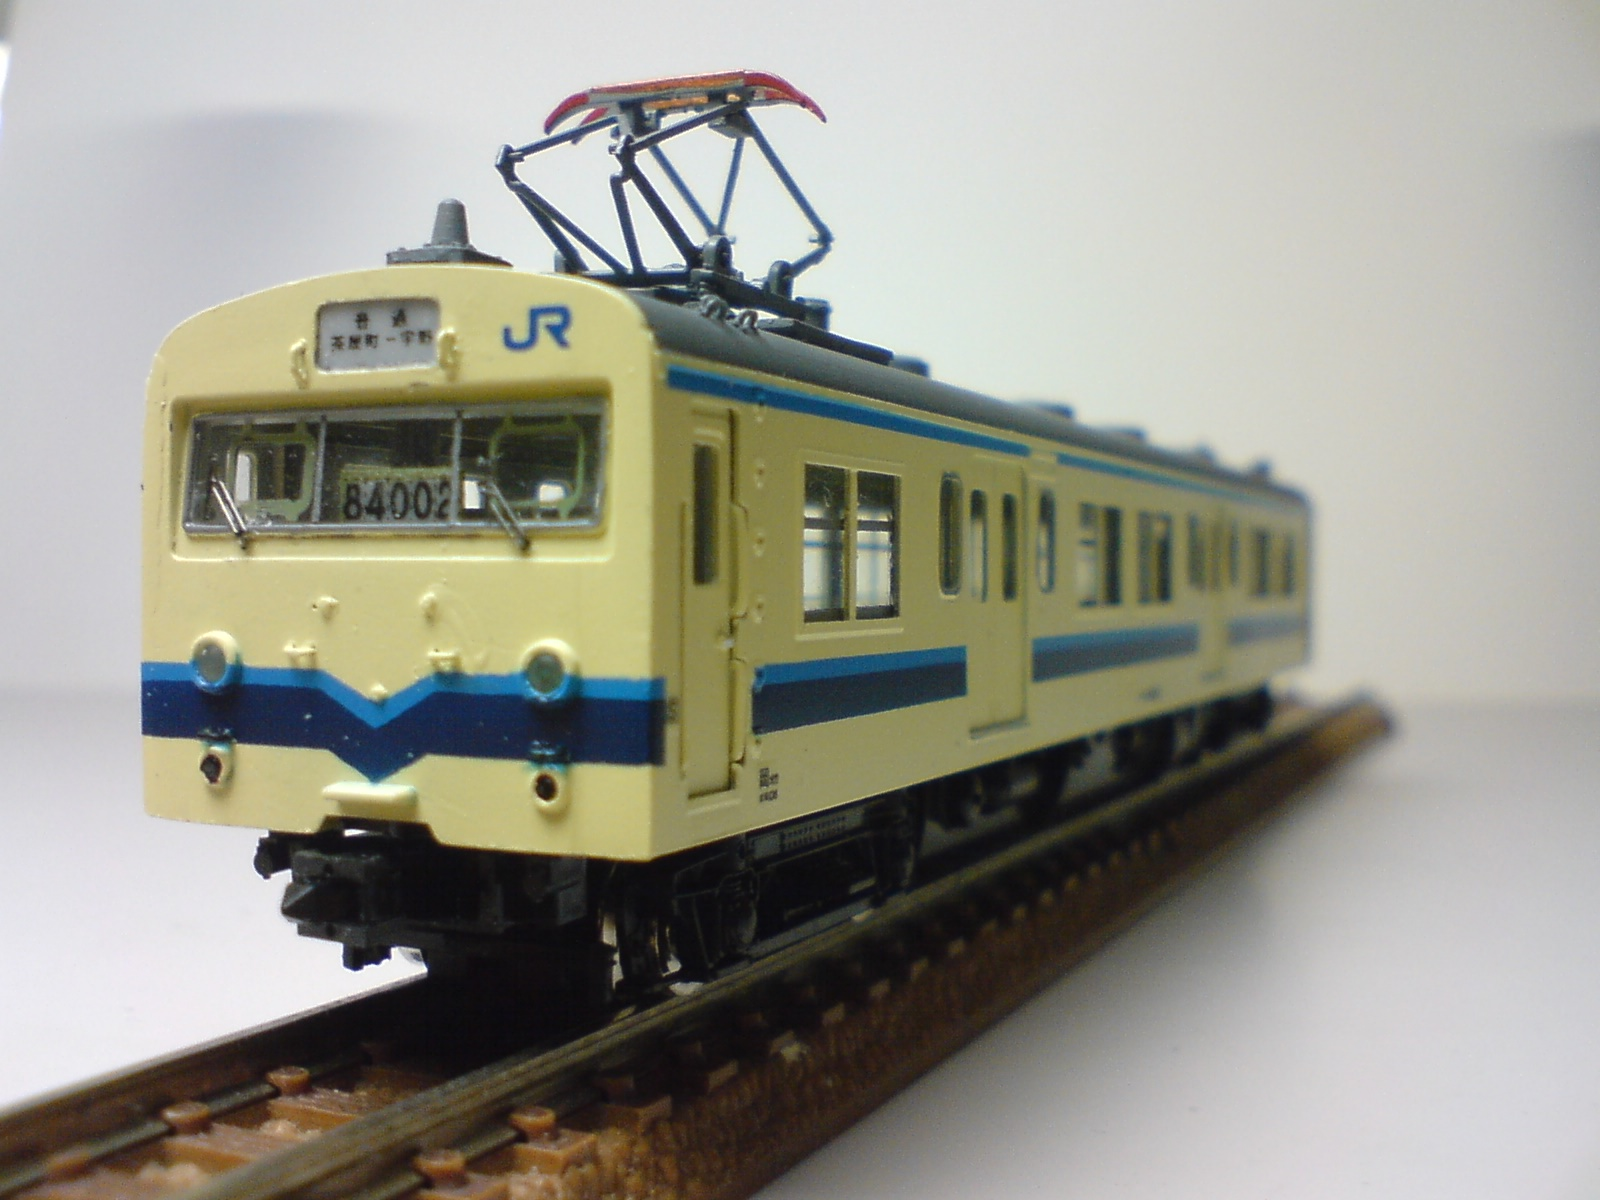 Kc380009